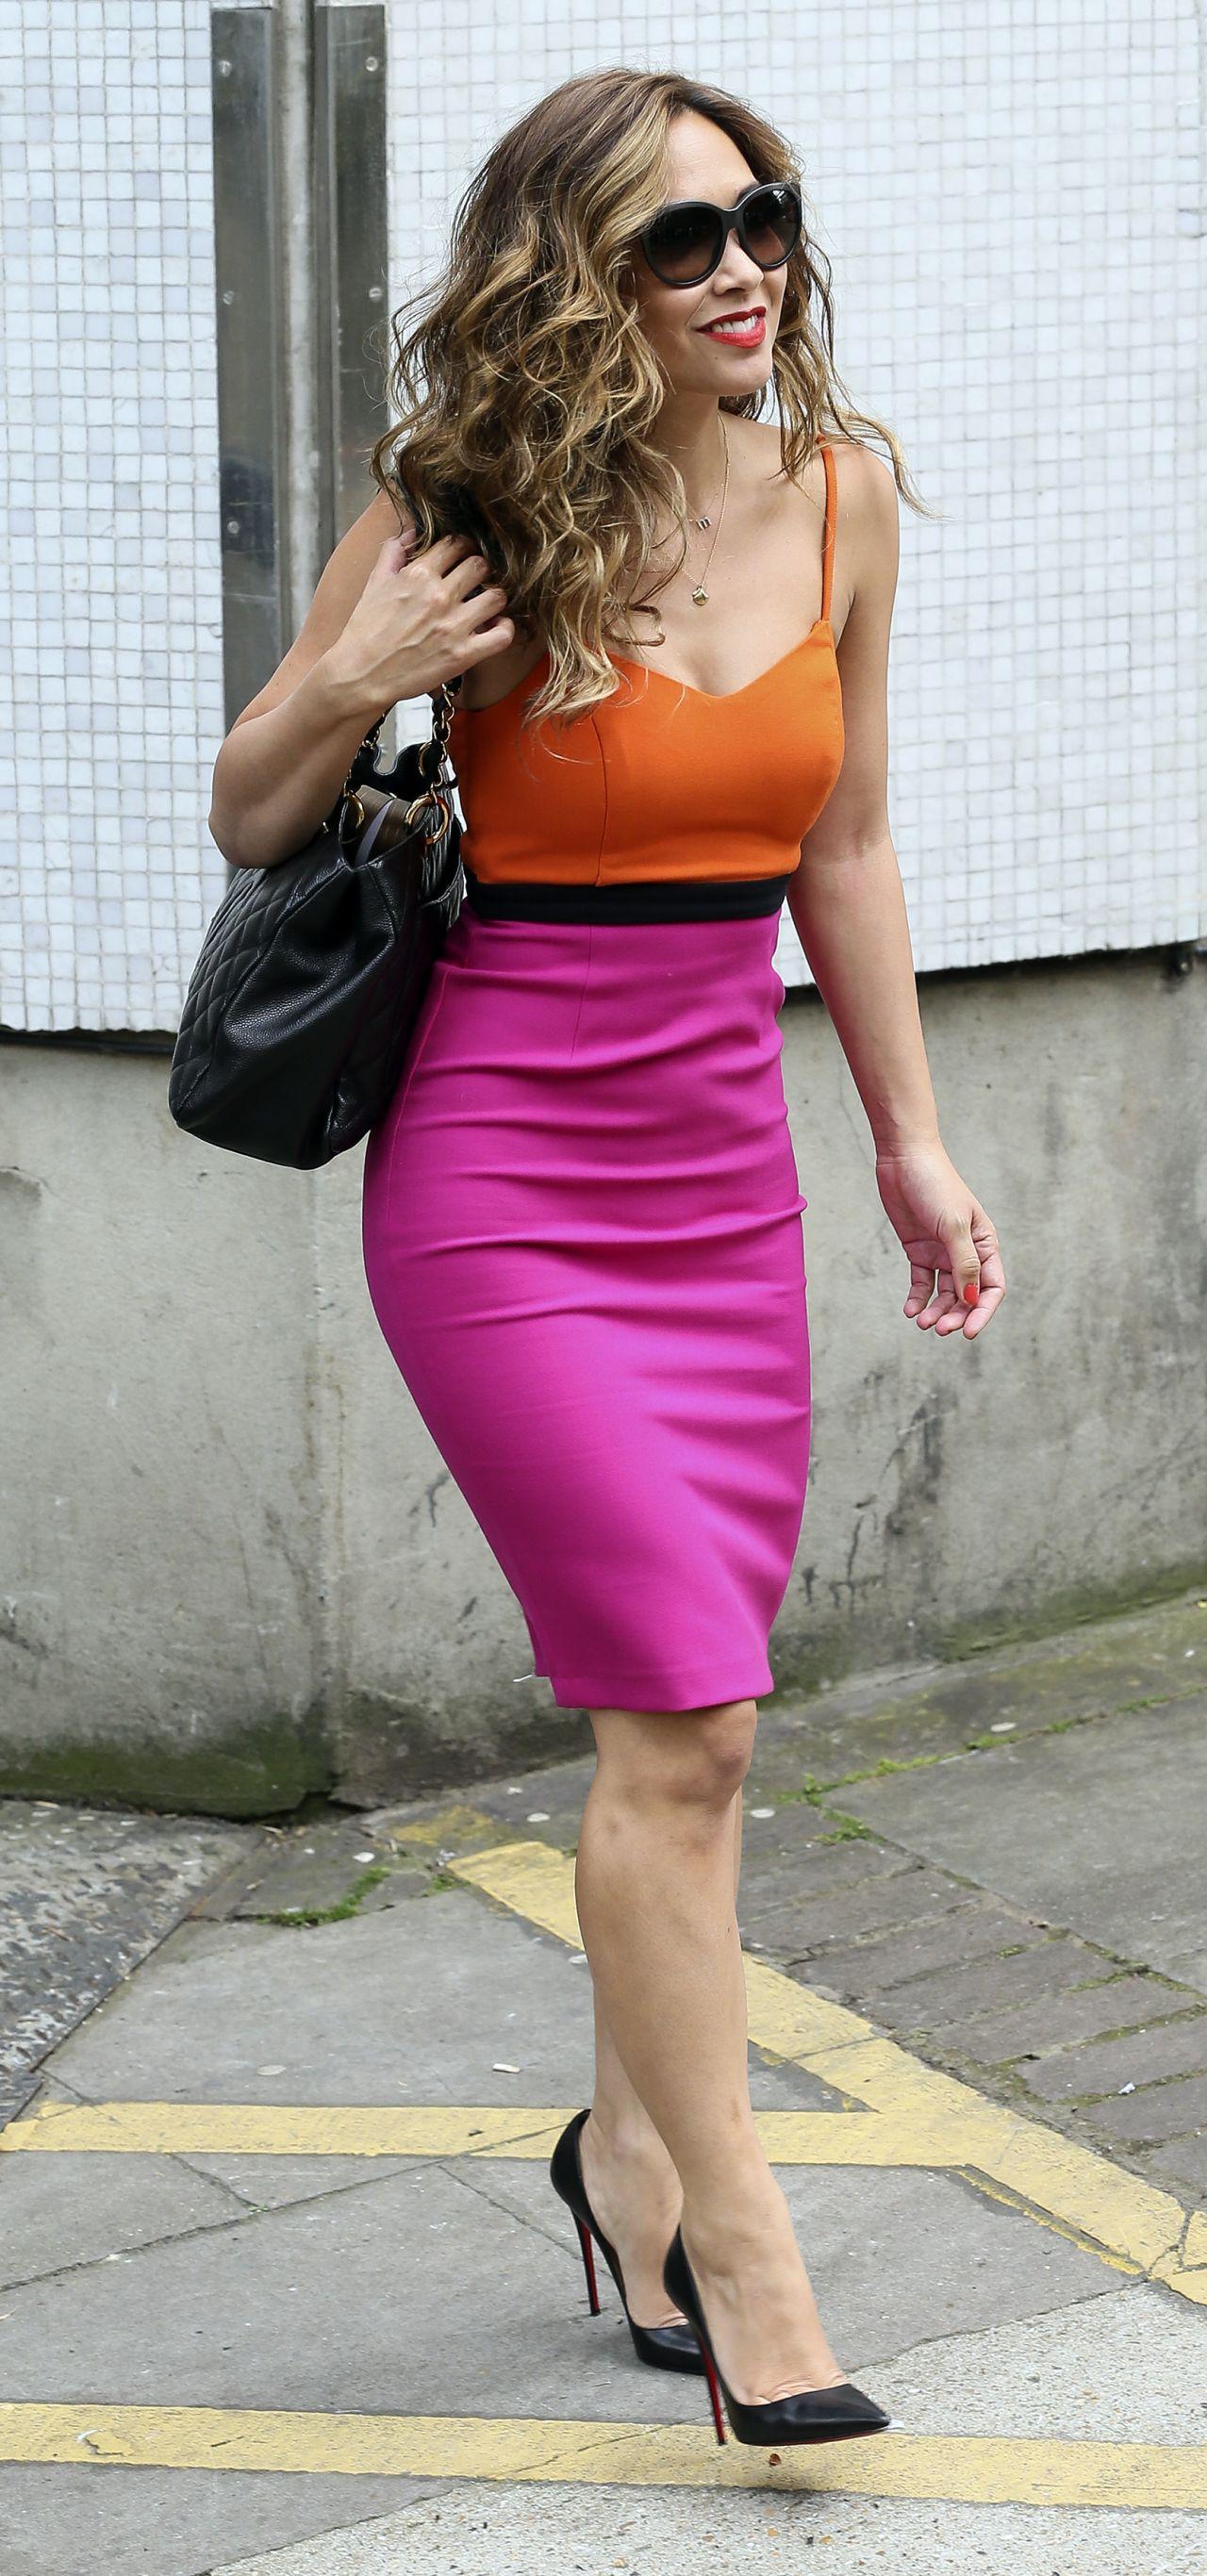 Myleene Klass Leaving The Itv Studios In London June 2014